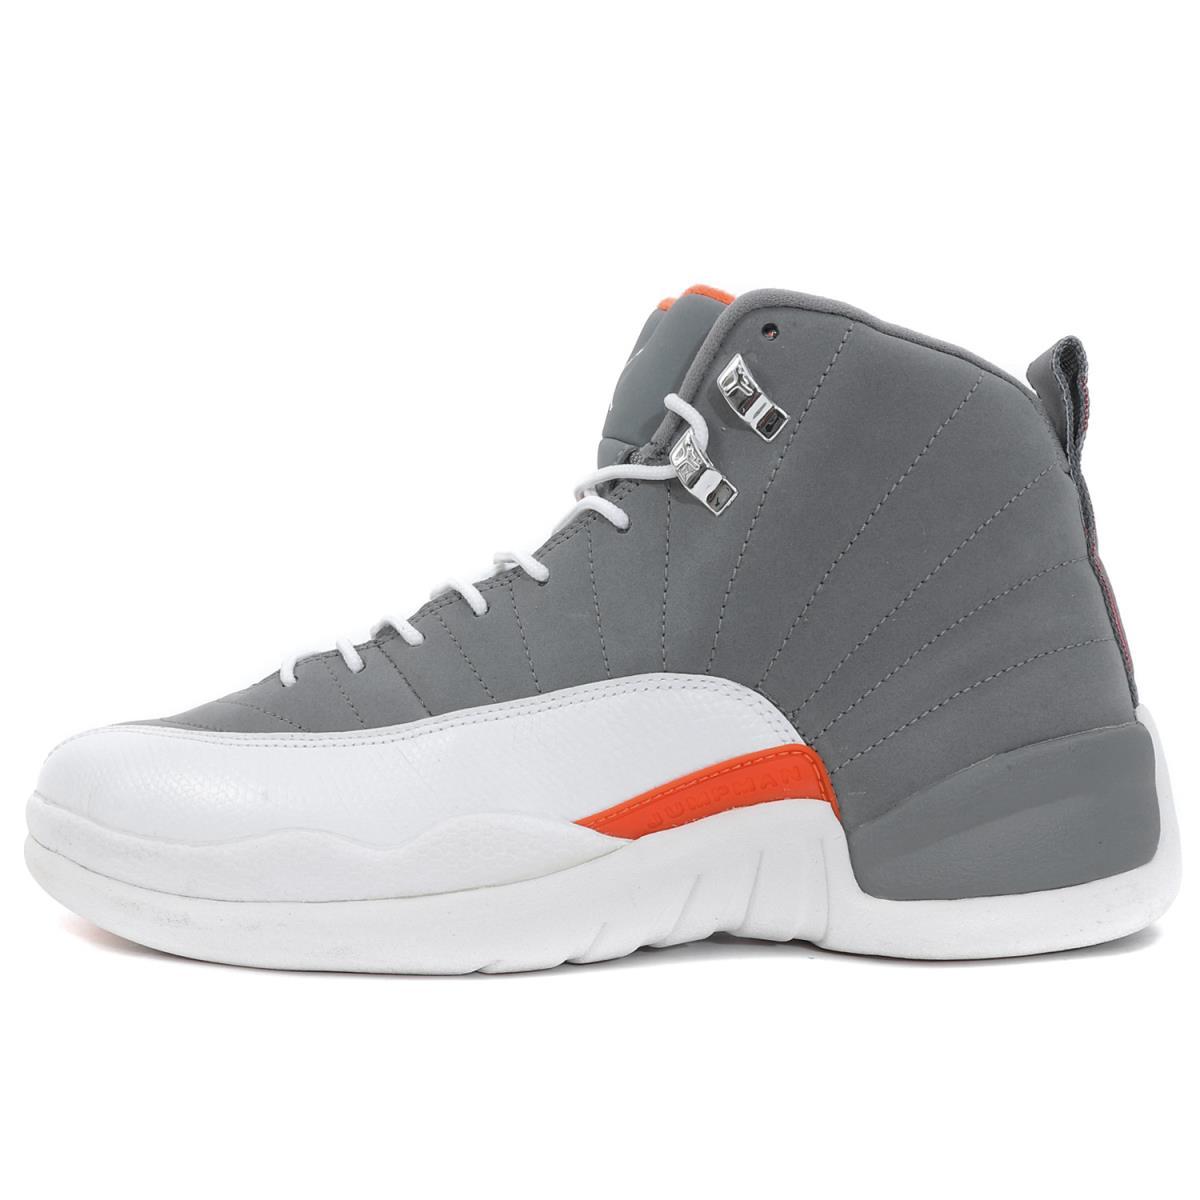 outlet store 1fd30 5d387 NIKE (Nike) AIR JORDAN 12 RETRO COOL GREY (130,690-012) cool gray X white  US10.5(28.5cm)